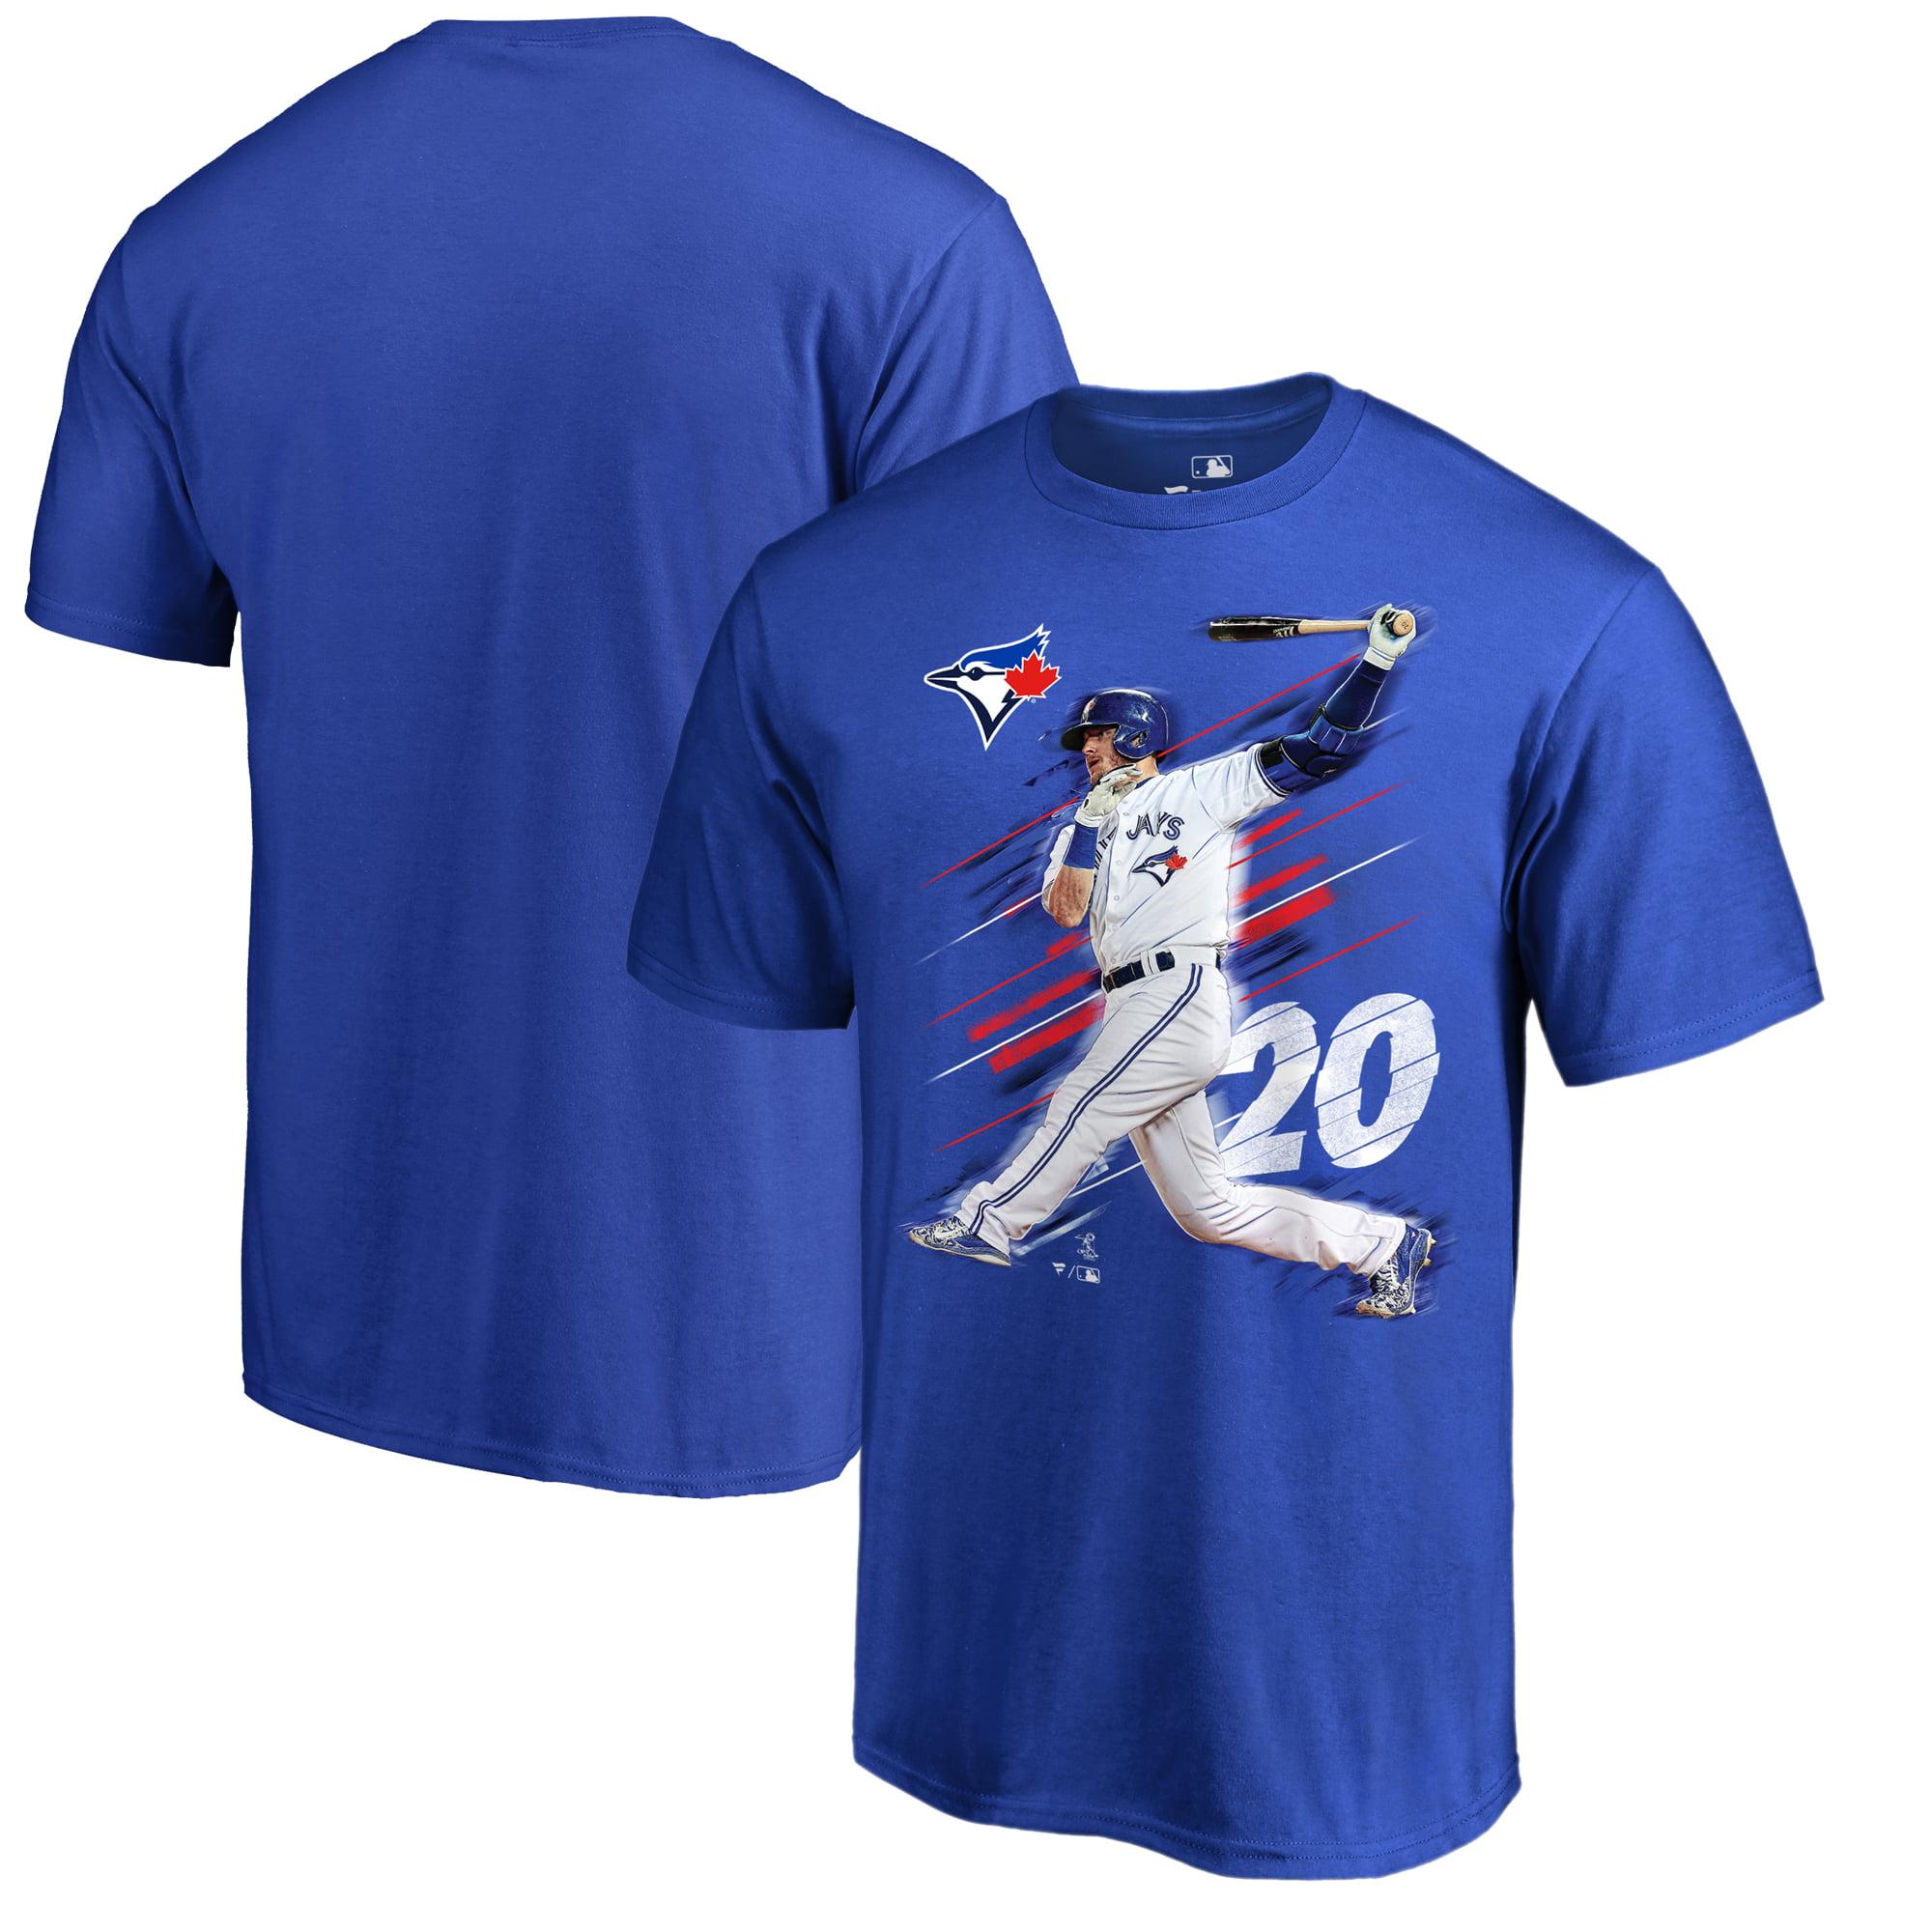 Josh Donaldson Toronto Blue Jays Fanatics Branded Fade Away T-Shirt - Royal